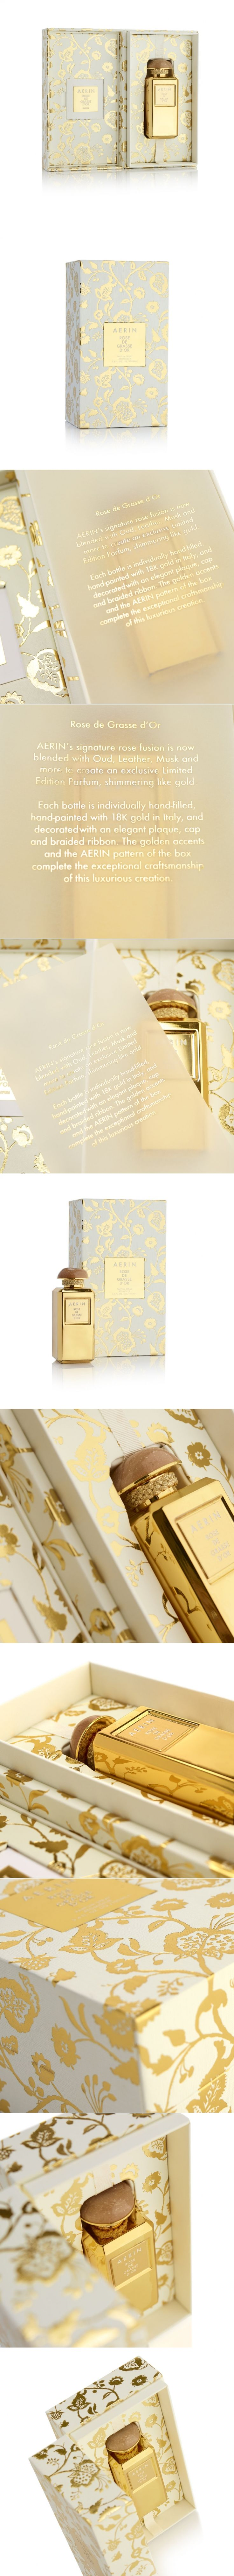 Live Like Royalty with Aerin Rose de Glasse d'Or Fragrance — The Dieline   Packaging & Branding Design & Innovation News